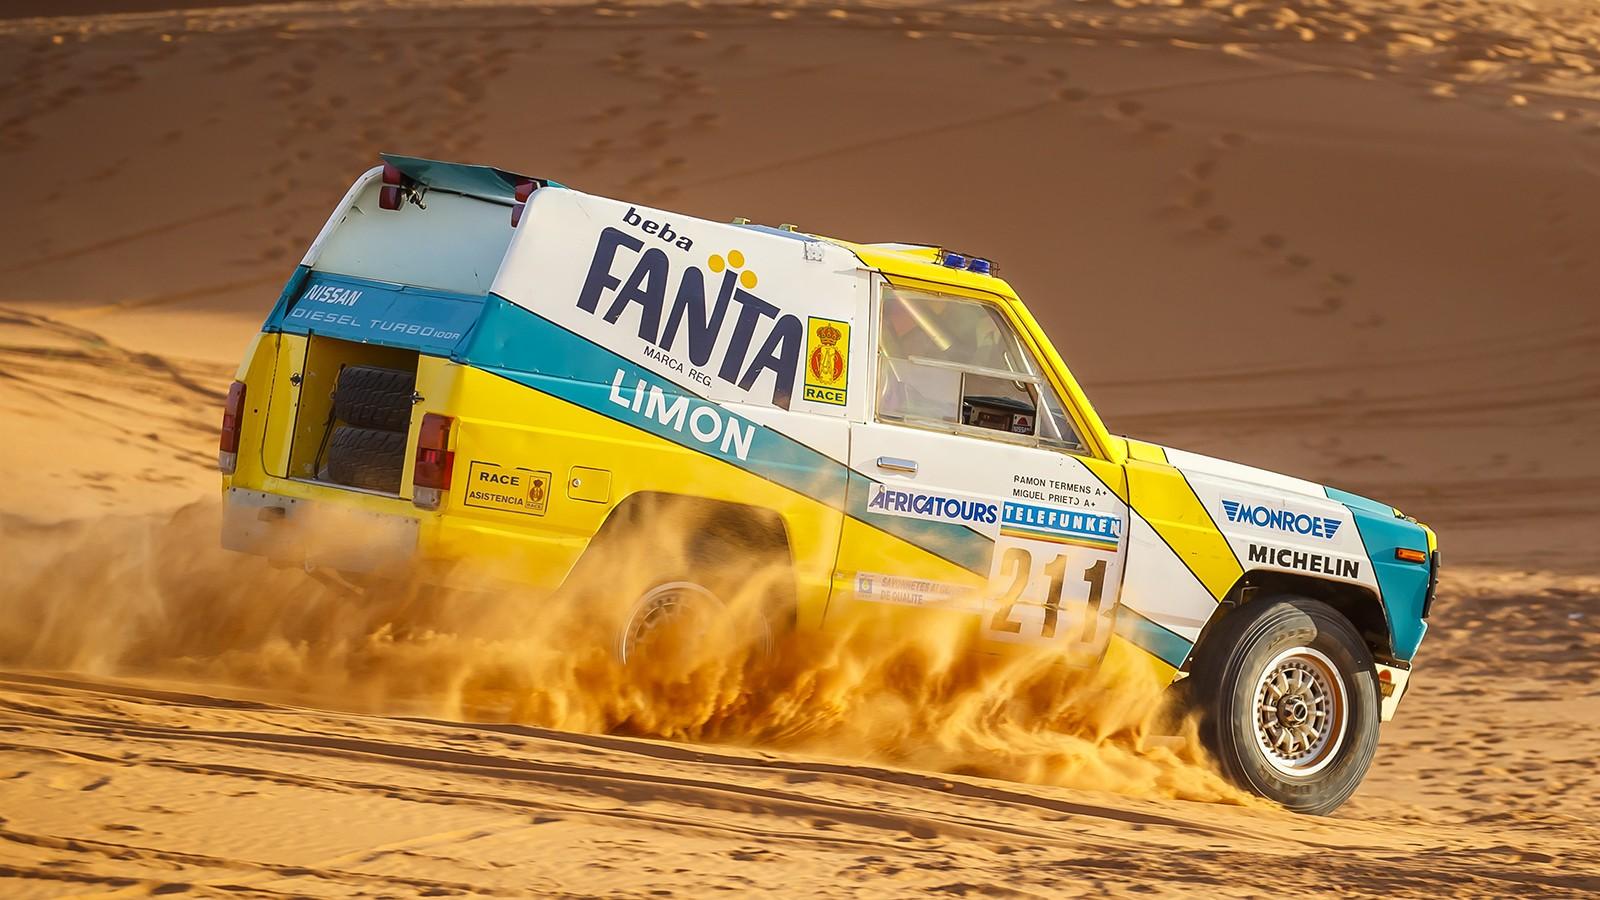 30 years on: Nissan's iconic 1987 Paris-Dakar rally car rides